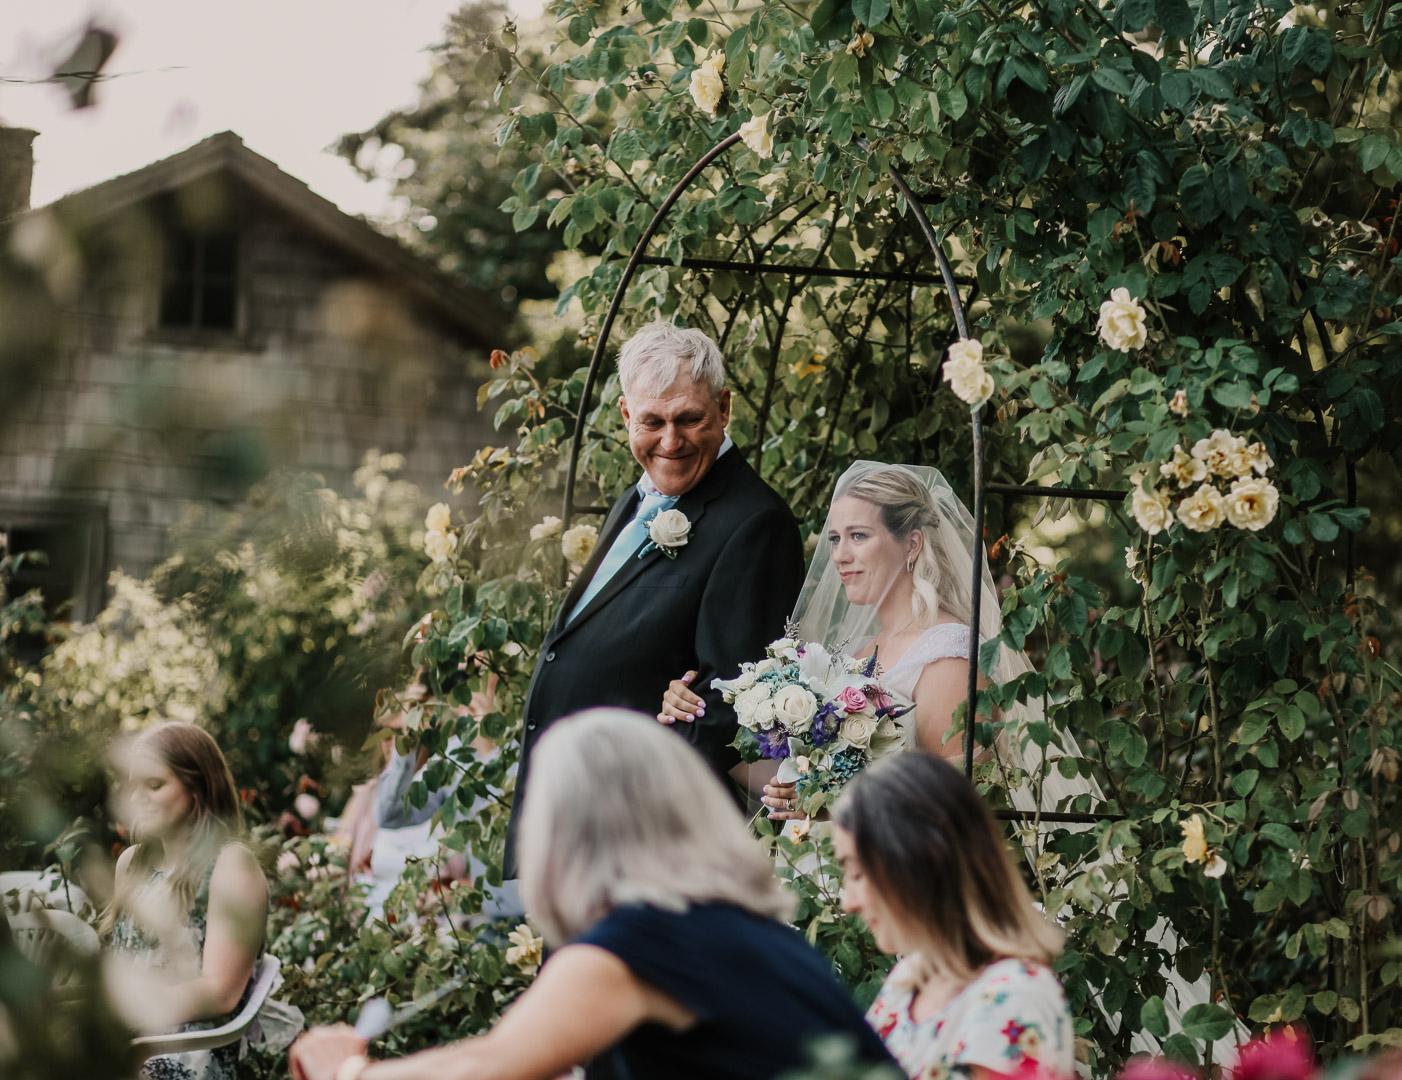 Kelsey Lageri Photography's Cedar- Elopement & Intimate Wedding Package Photo